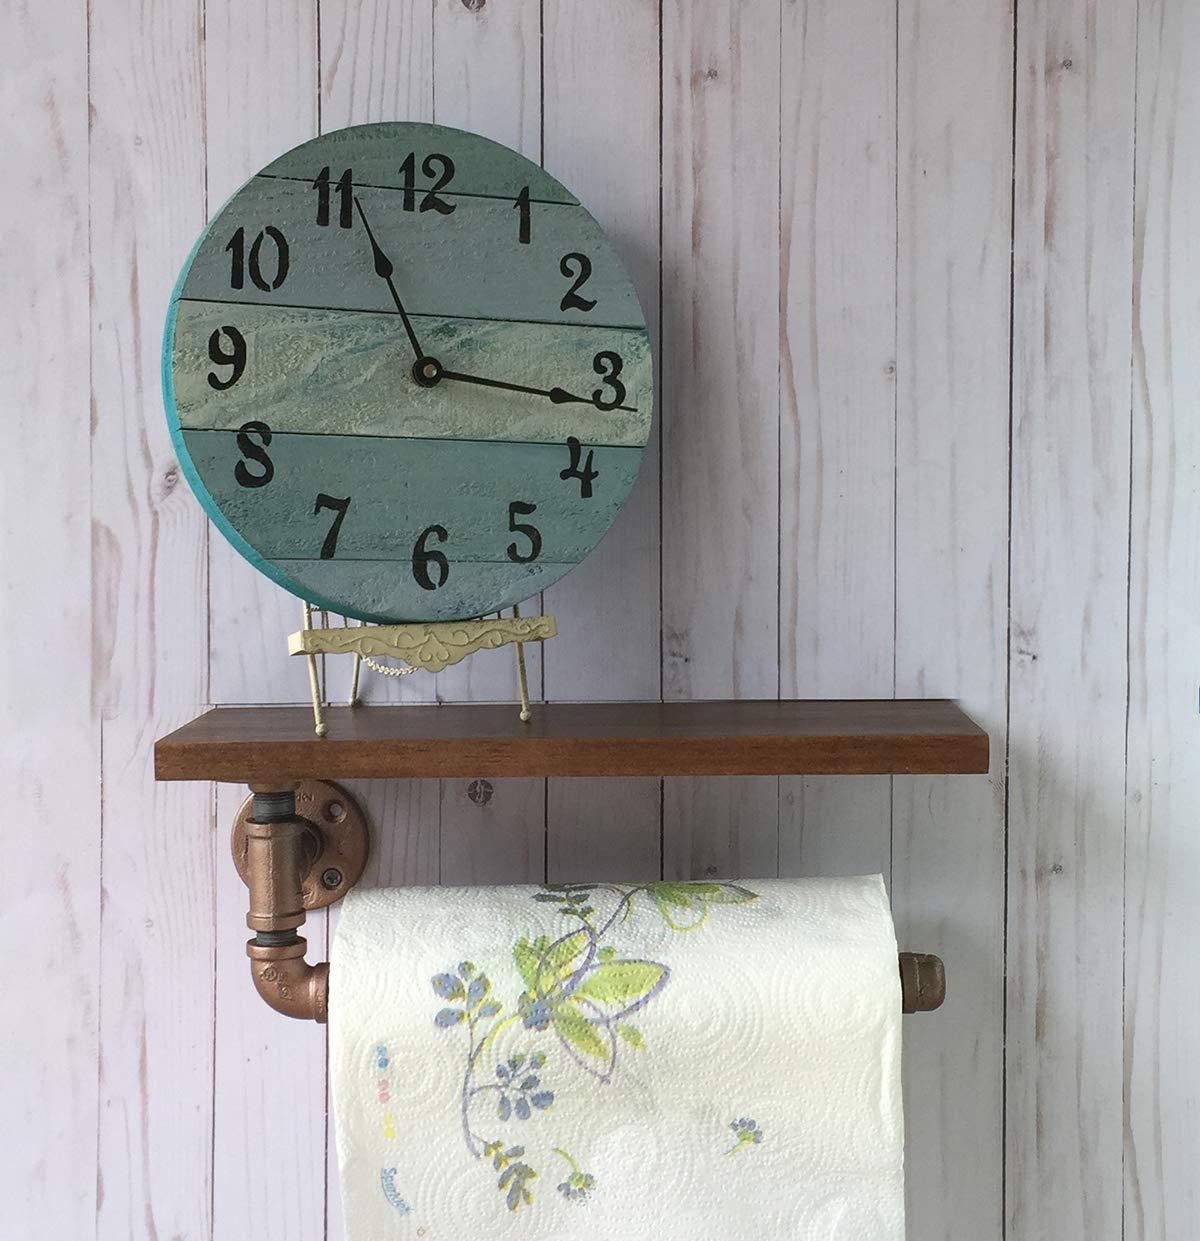 Industrial Paper Towel Holder farmhouse style walnut finish Hardwood Shelf iron pipe Kitchen Accessory